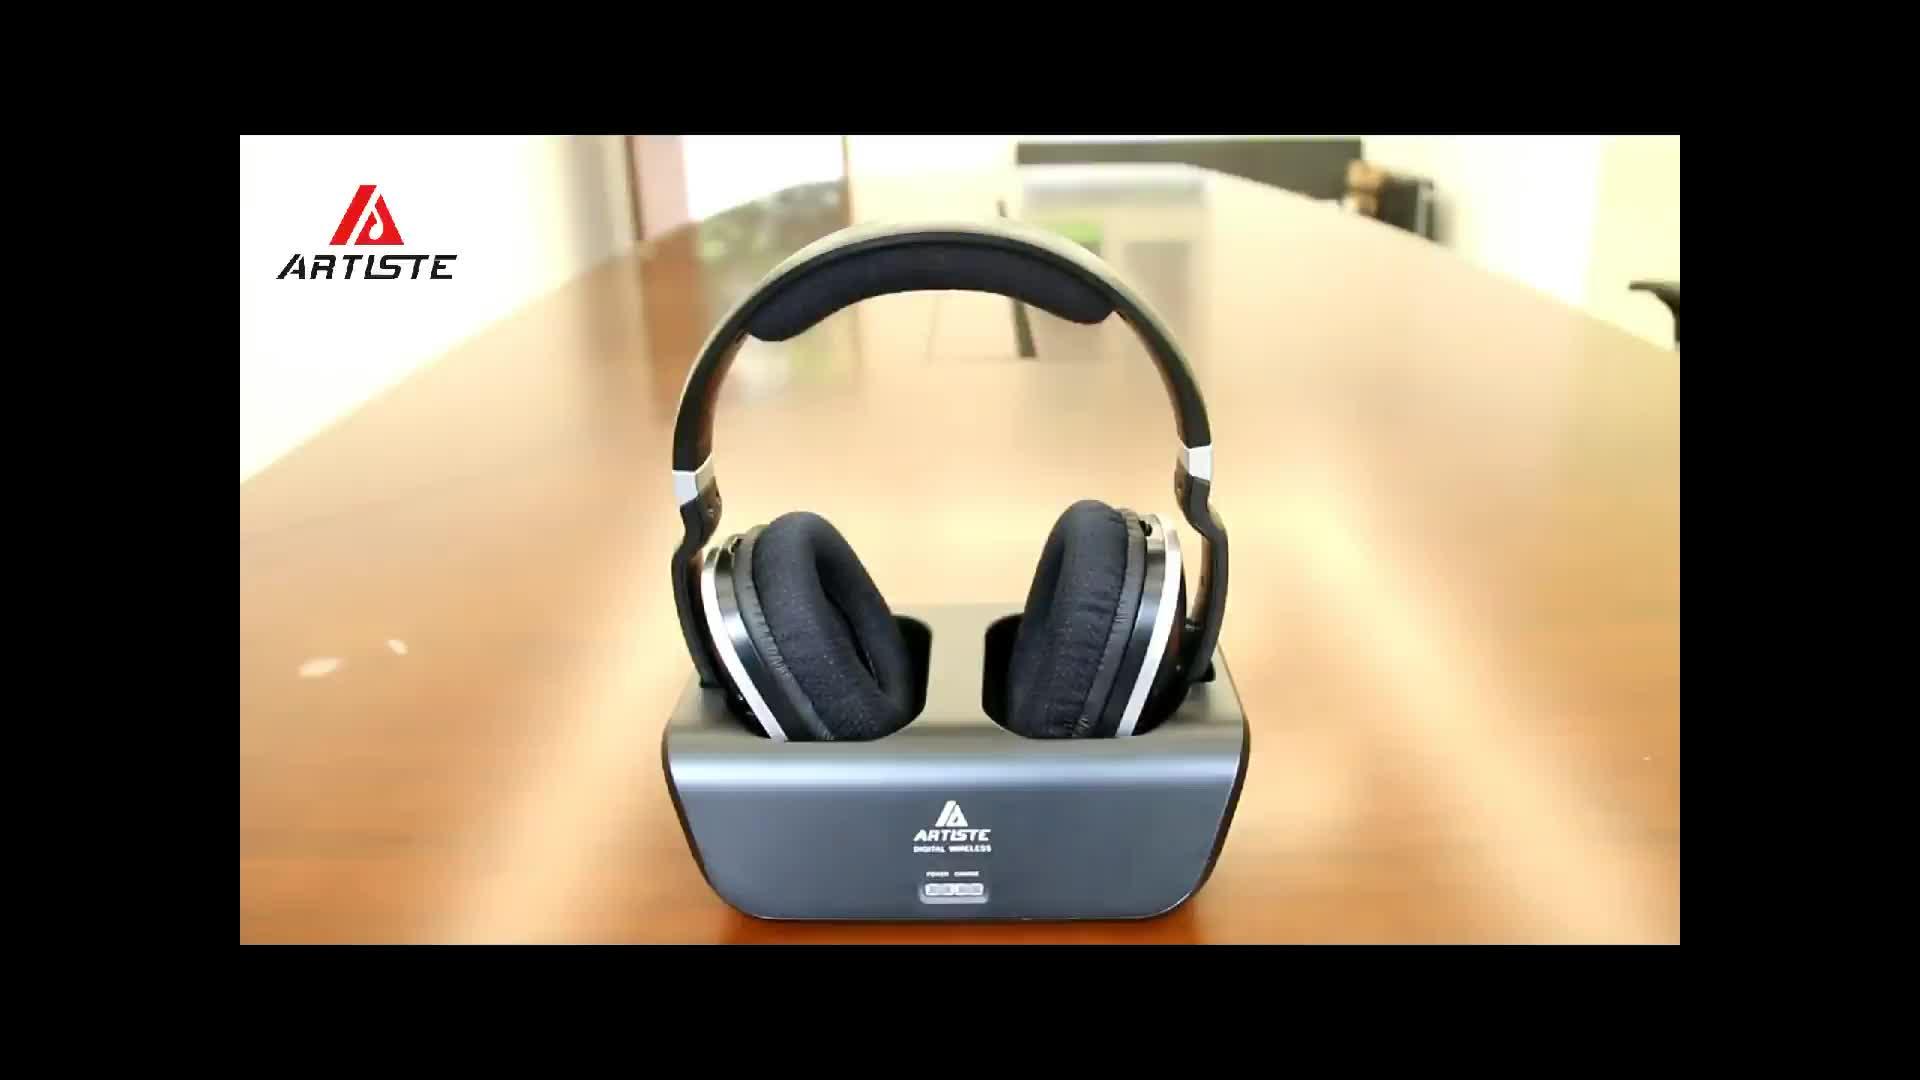 OEM auricular fabricación casa teatro estéreo auriculares inalámbricos para Tv